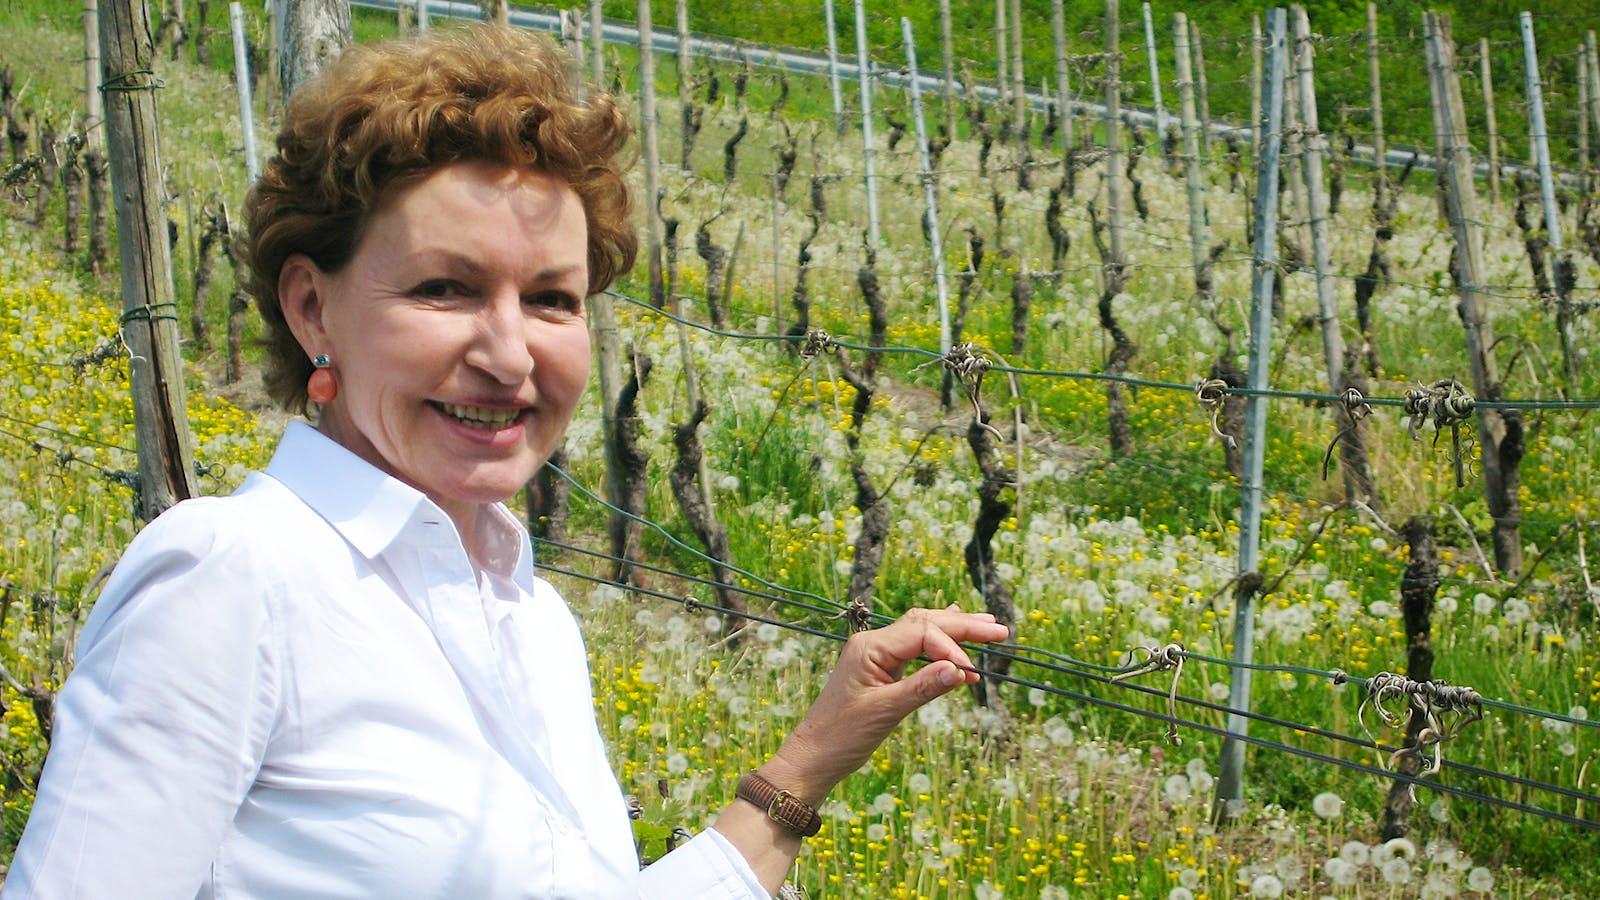 German Vintner Annegret Reh-Gartner Dies at 61